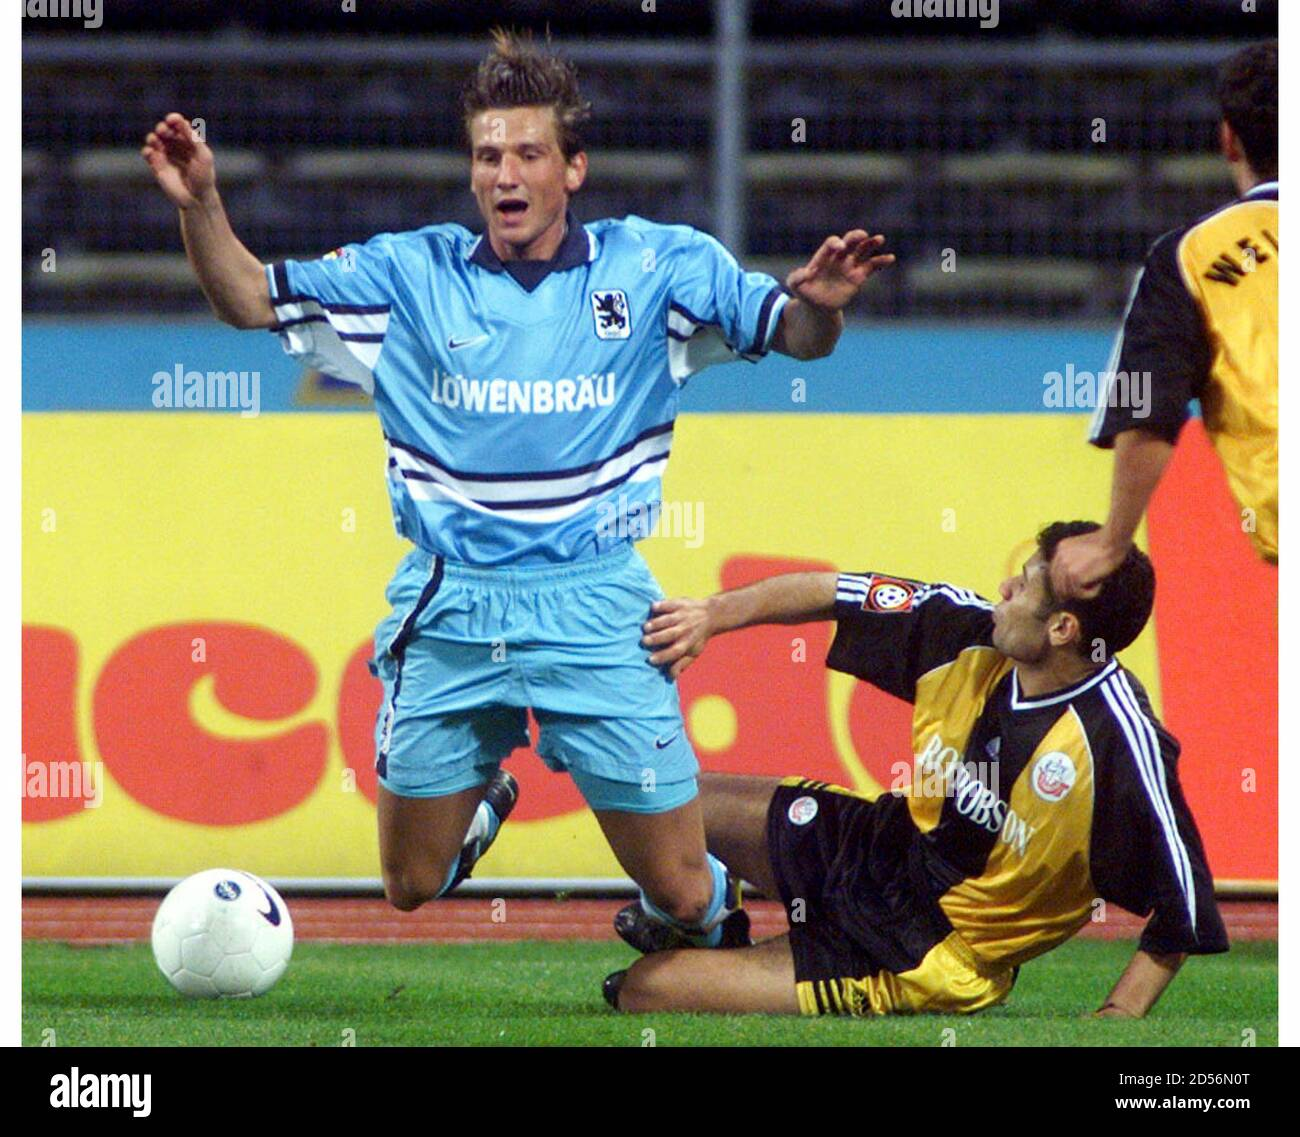 Stefan Malz Of Tsv 1860 Munich And Raduan Of Fc Hansa Rostock Fight For The Ball In Munichs Olympic Stadium Stefan Malz Of Tsv 1860 Munich L And Jasser Raduan Of Fc